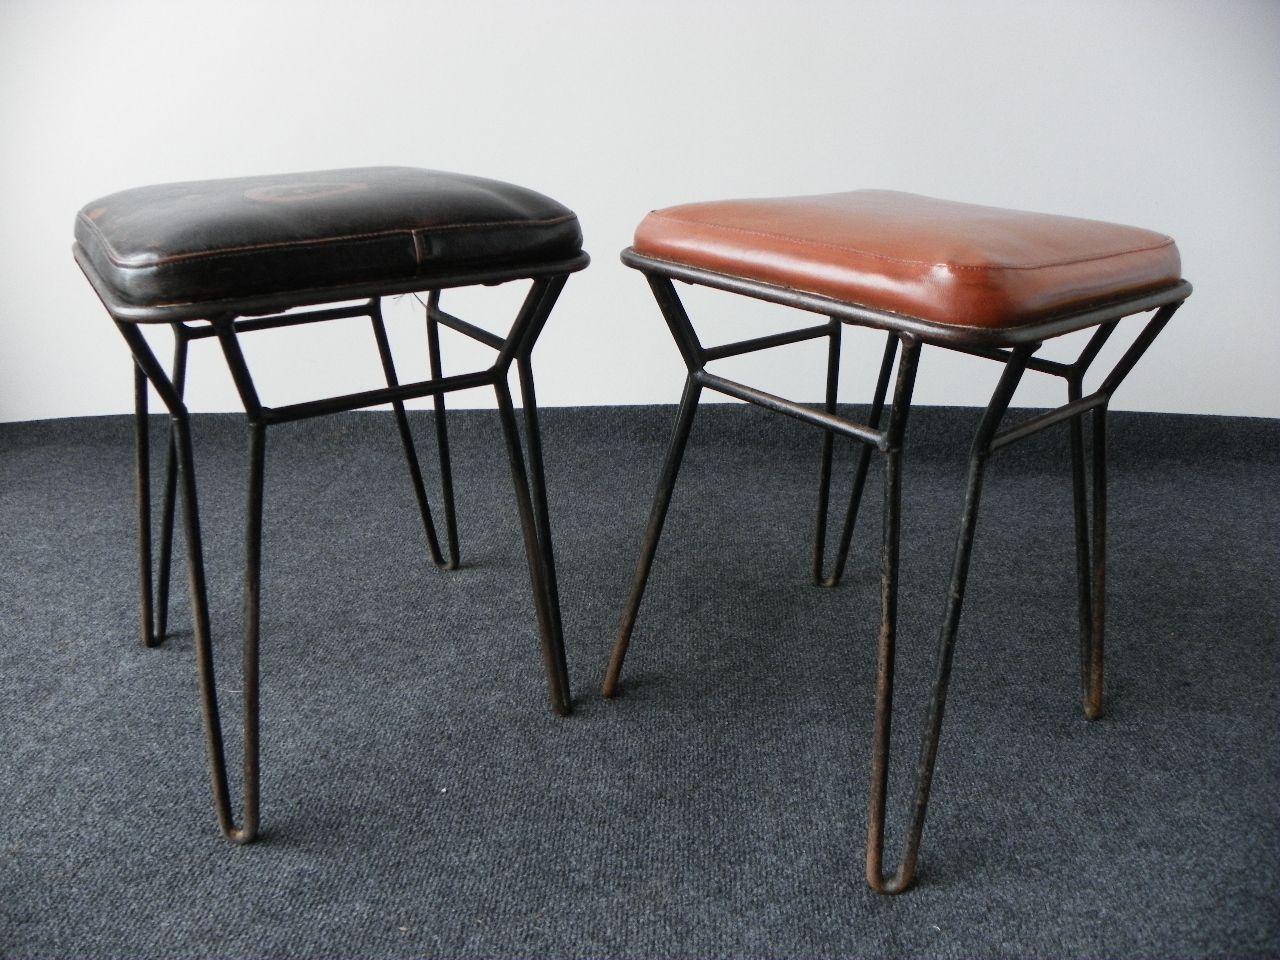 polnische industrielle hocker 1960er 2er set bei pamono kaufen. Black Bedroom Furniture Sets. Home Design Ideas